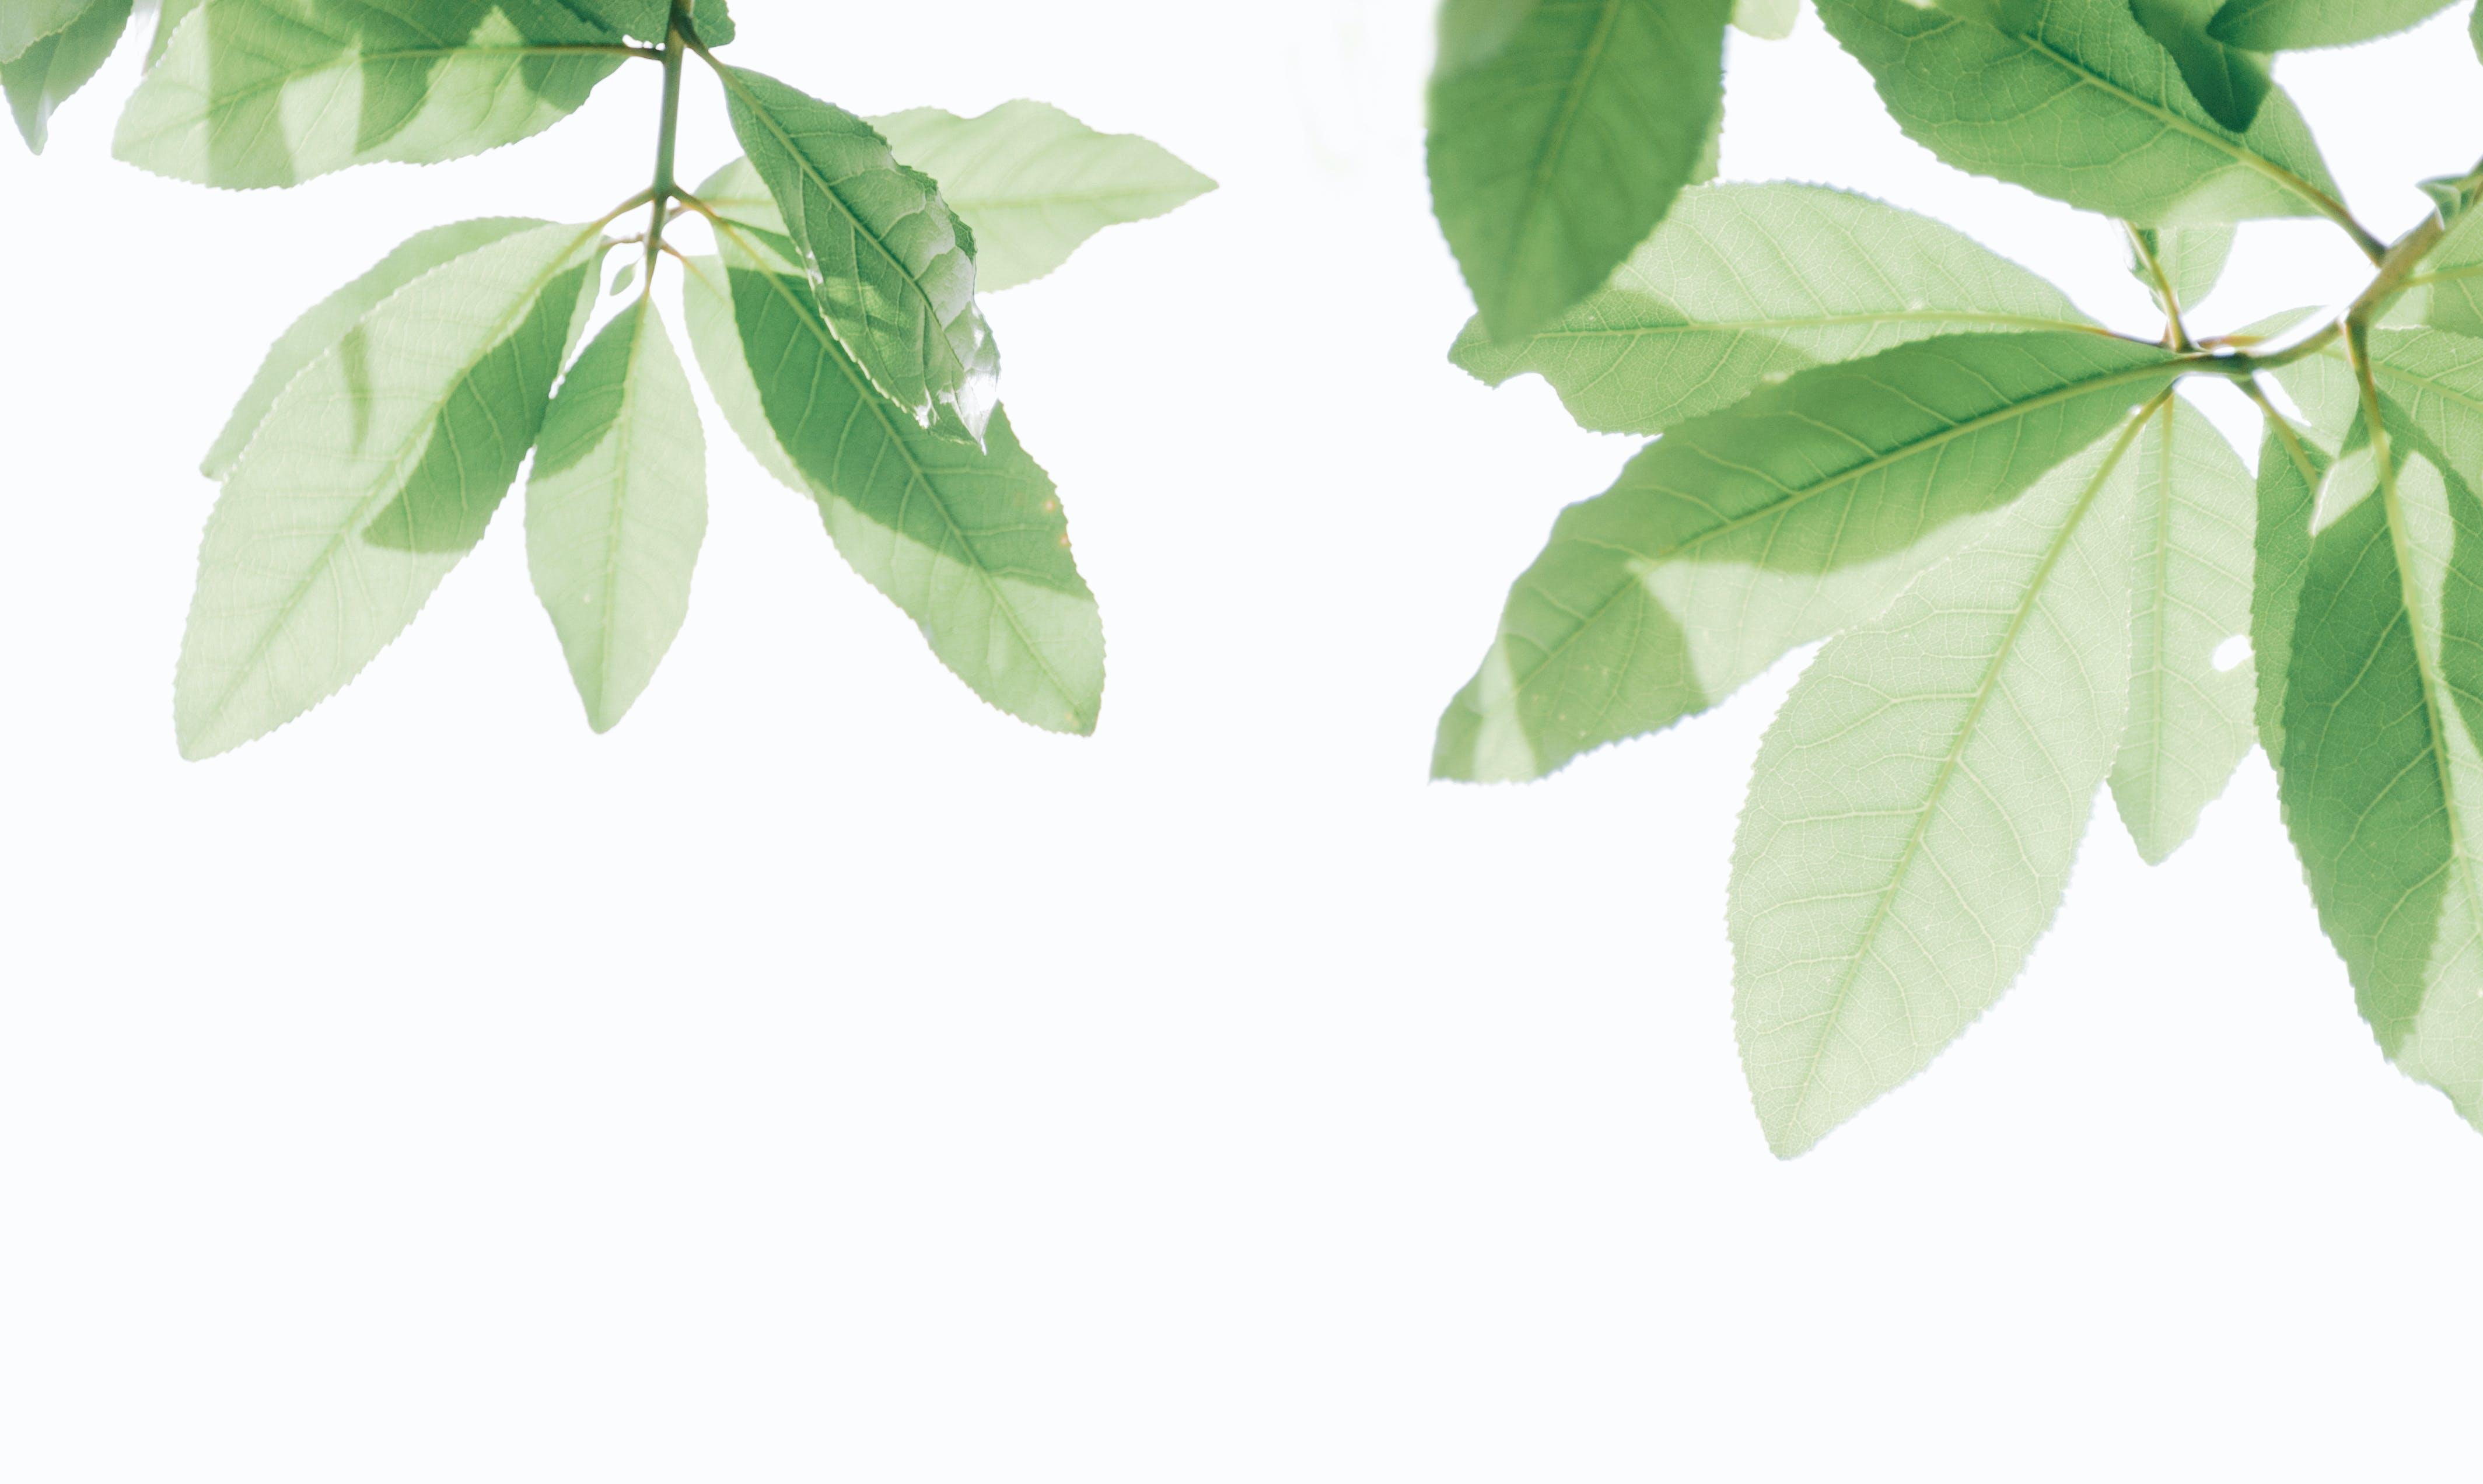 Immagine gratuita di albero, crescita, estate, freschezza